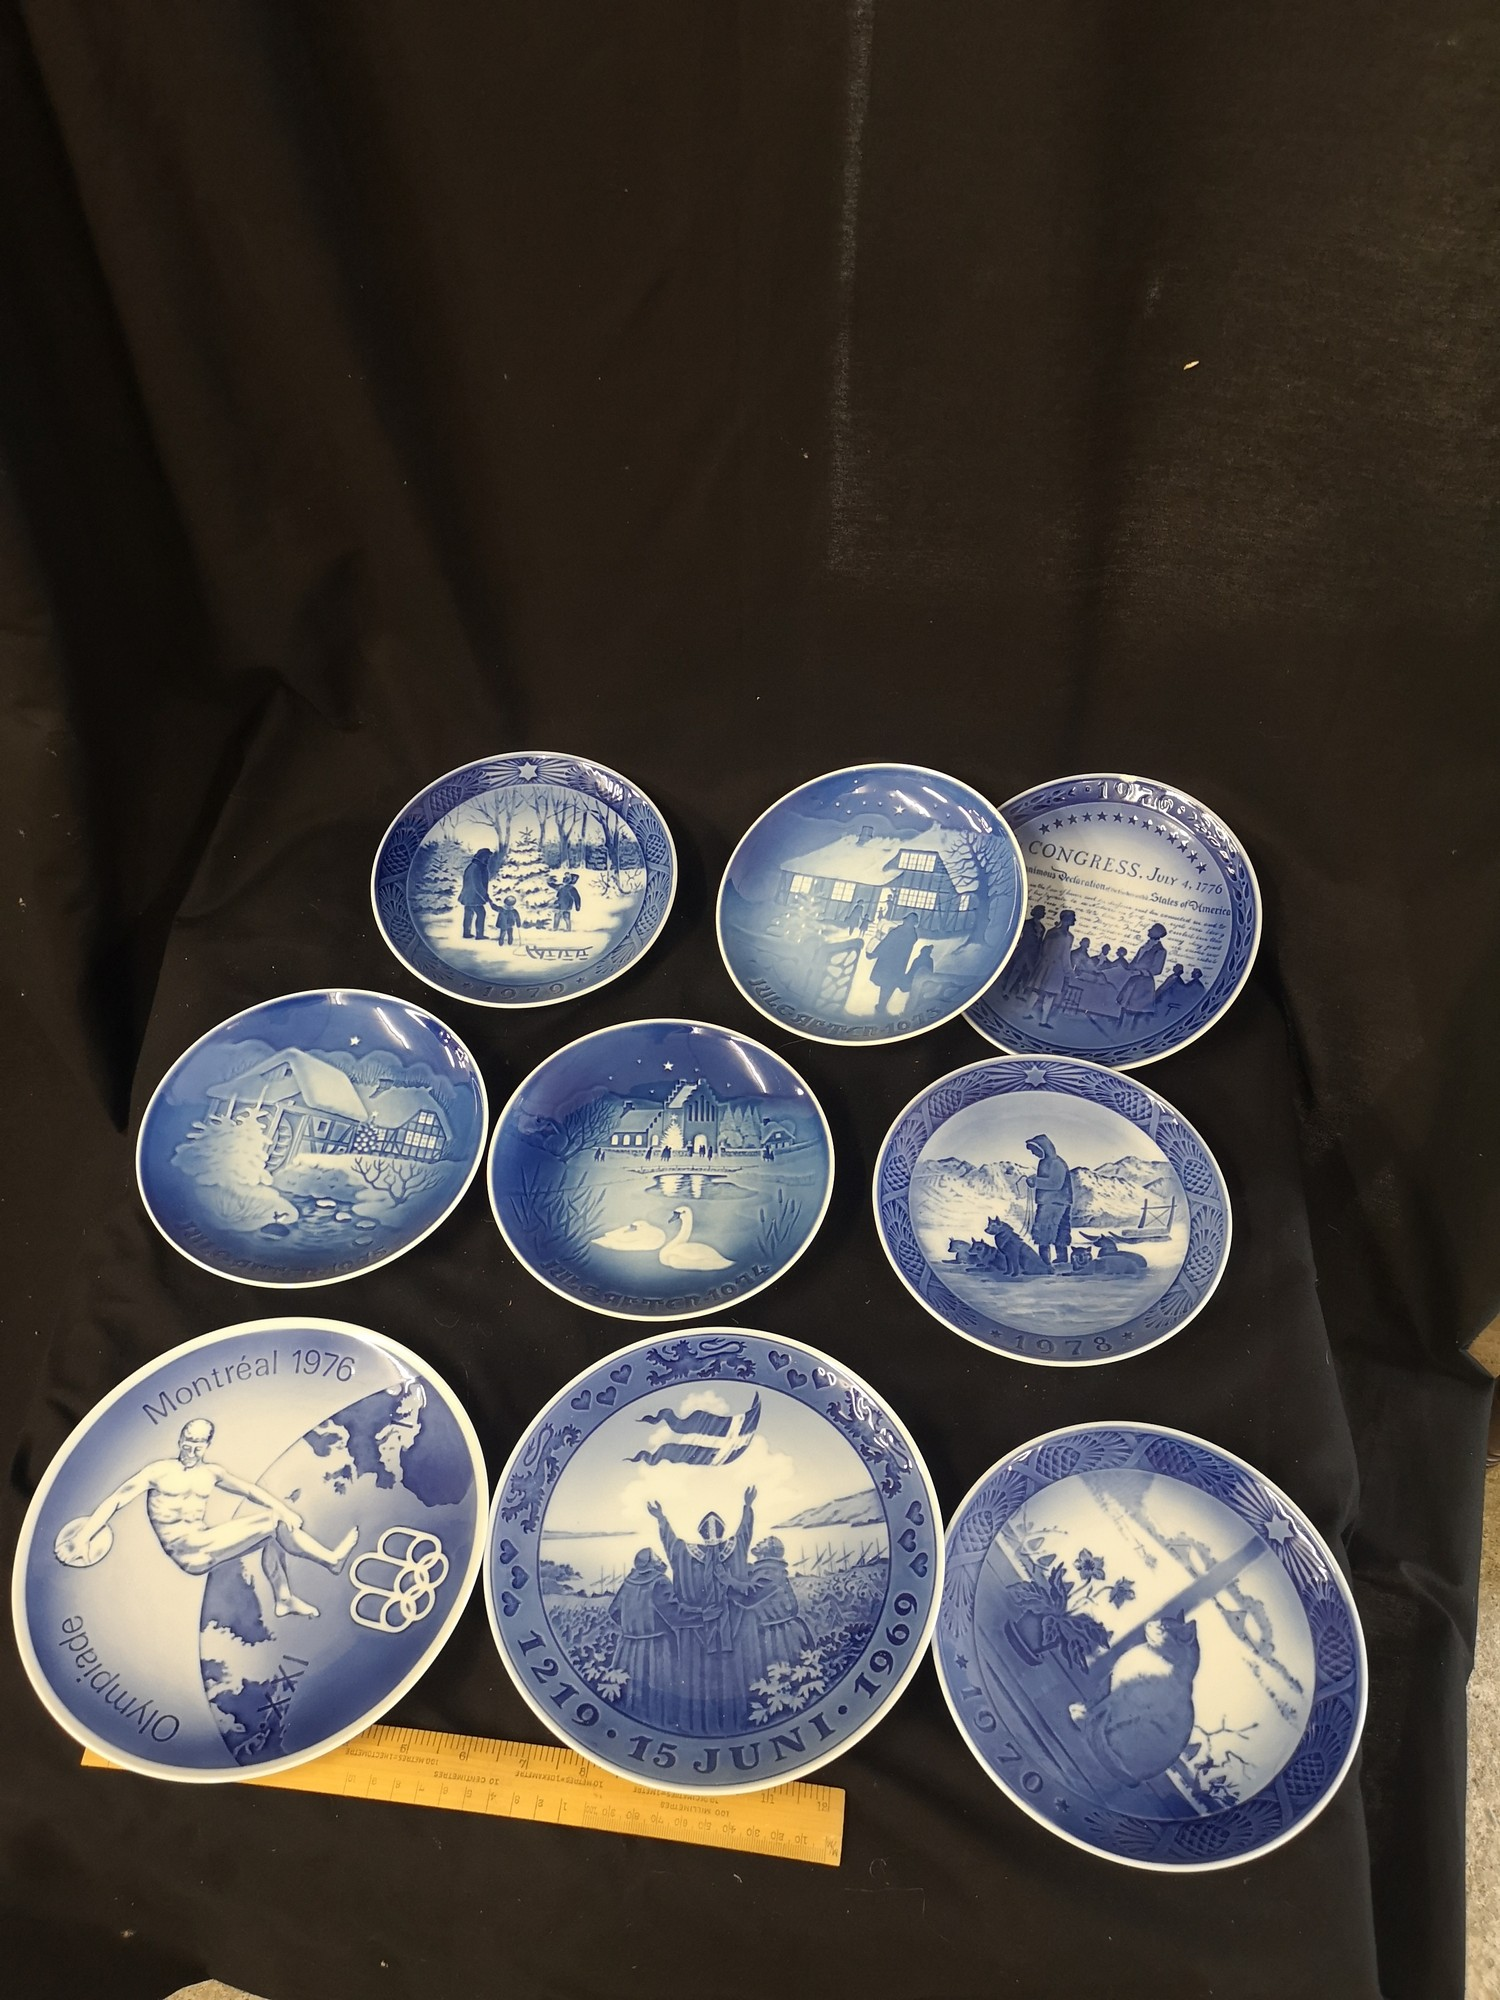 Collection of Royal Copenhagen Christmas plates. 1969 70s.